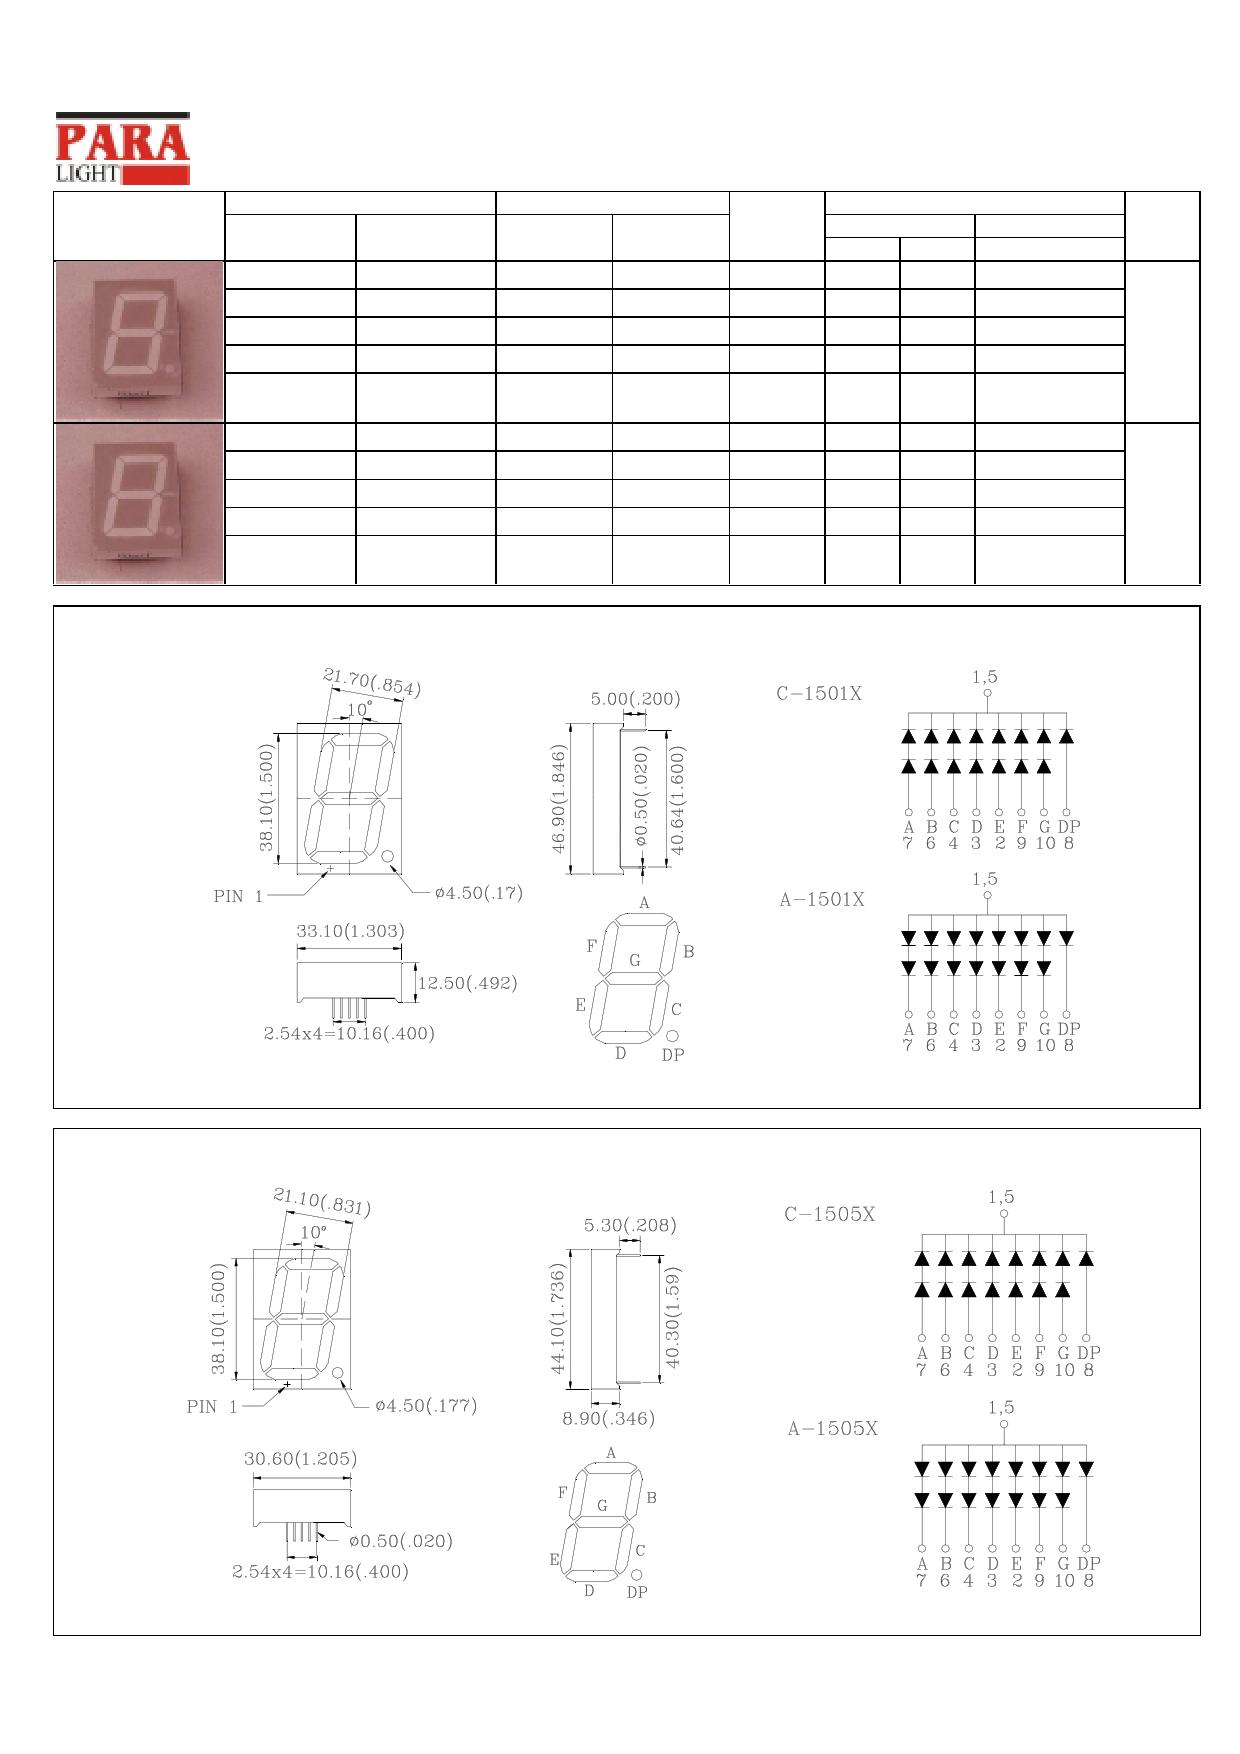 C-1501X datasheet